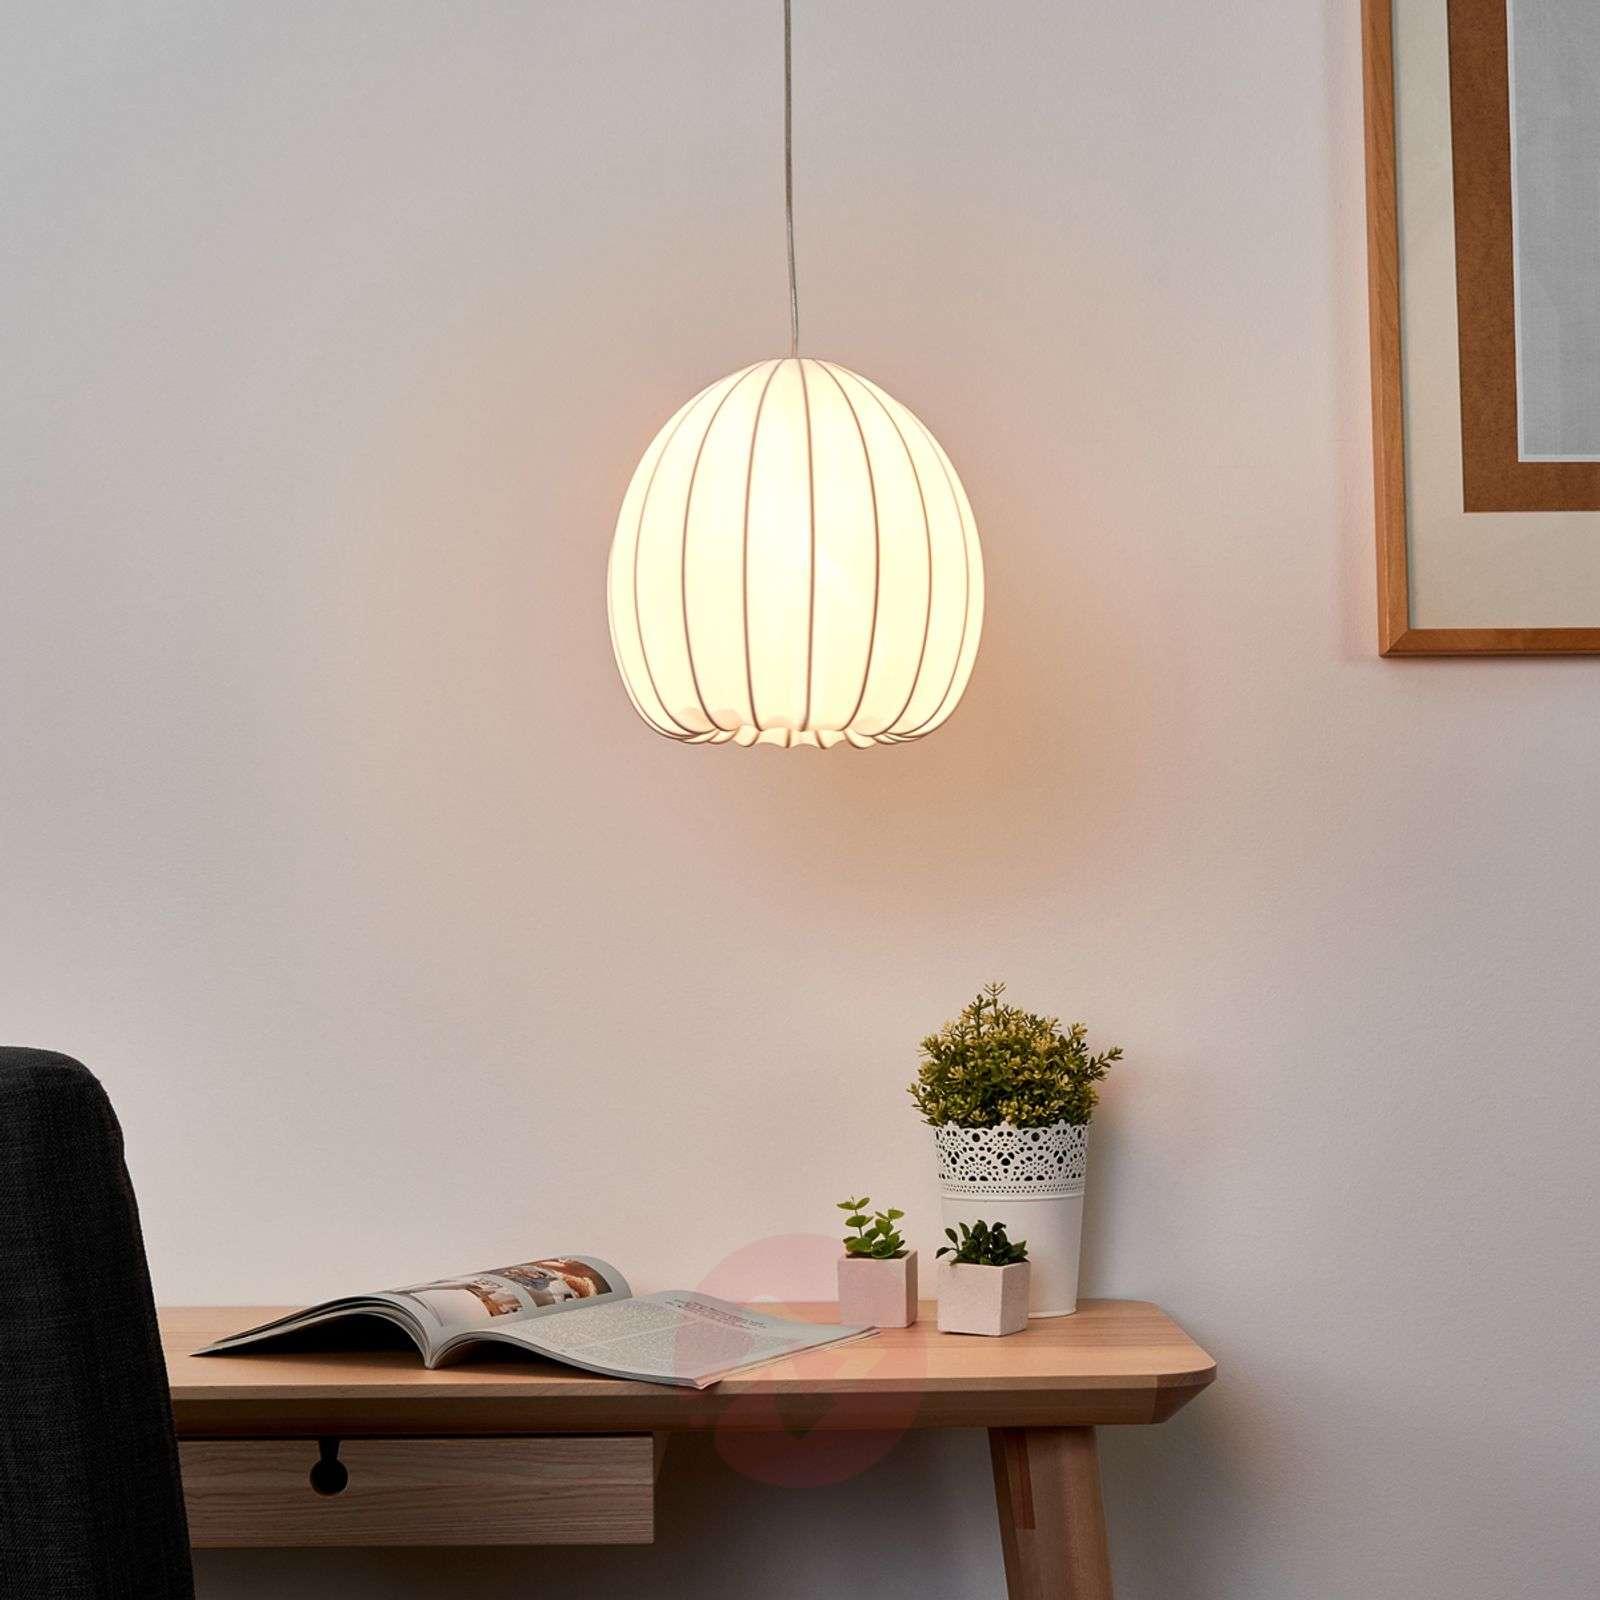 Axolight Muse hanging light in white, 25cm-1088051-01